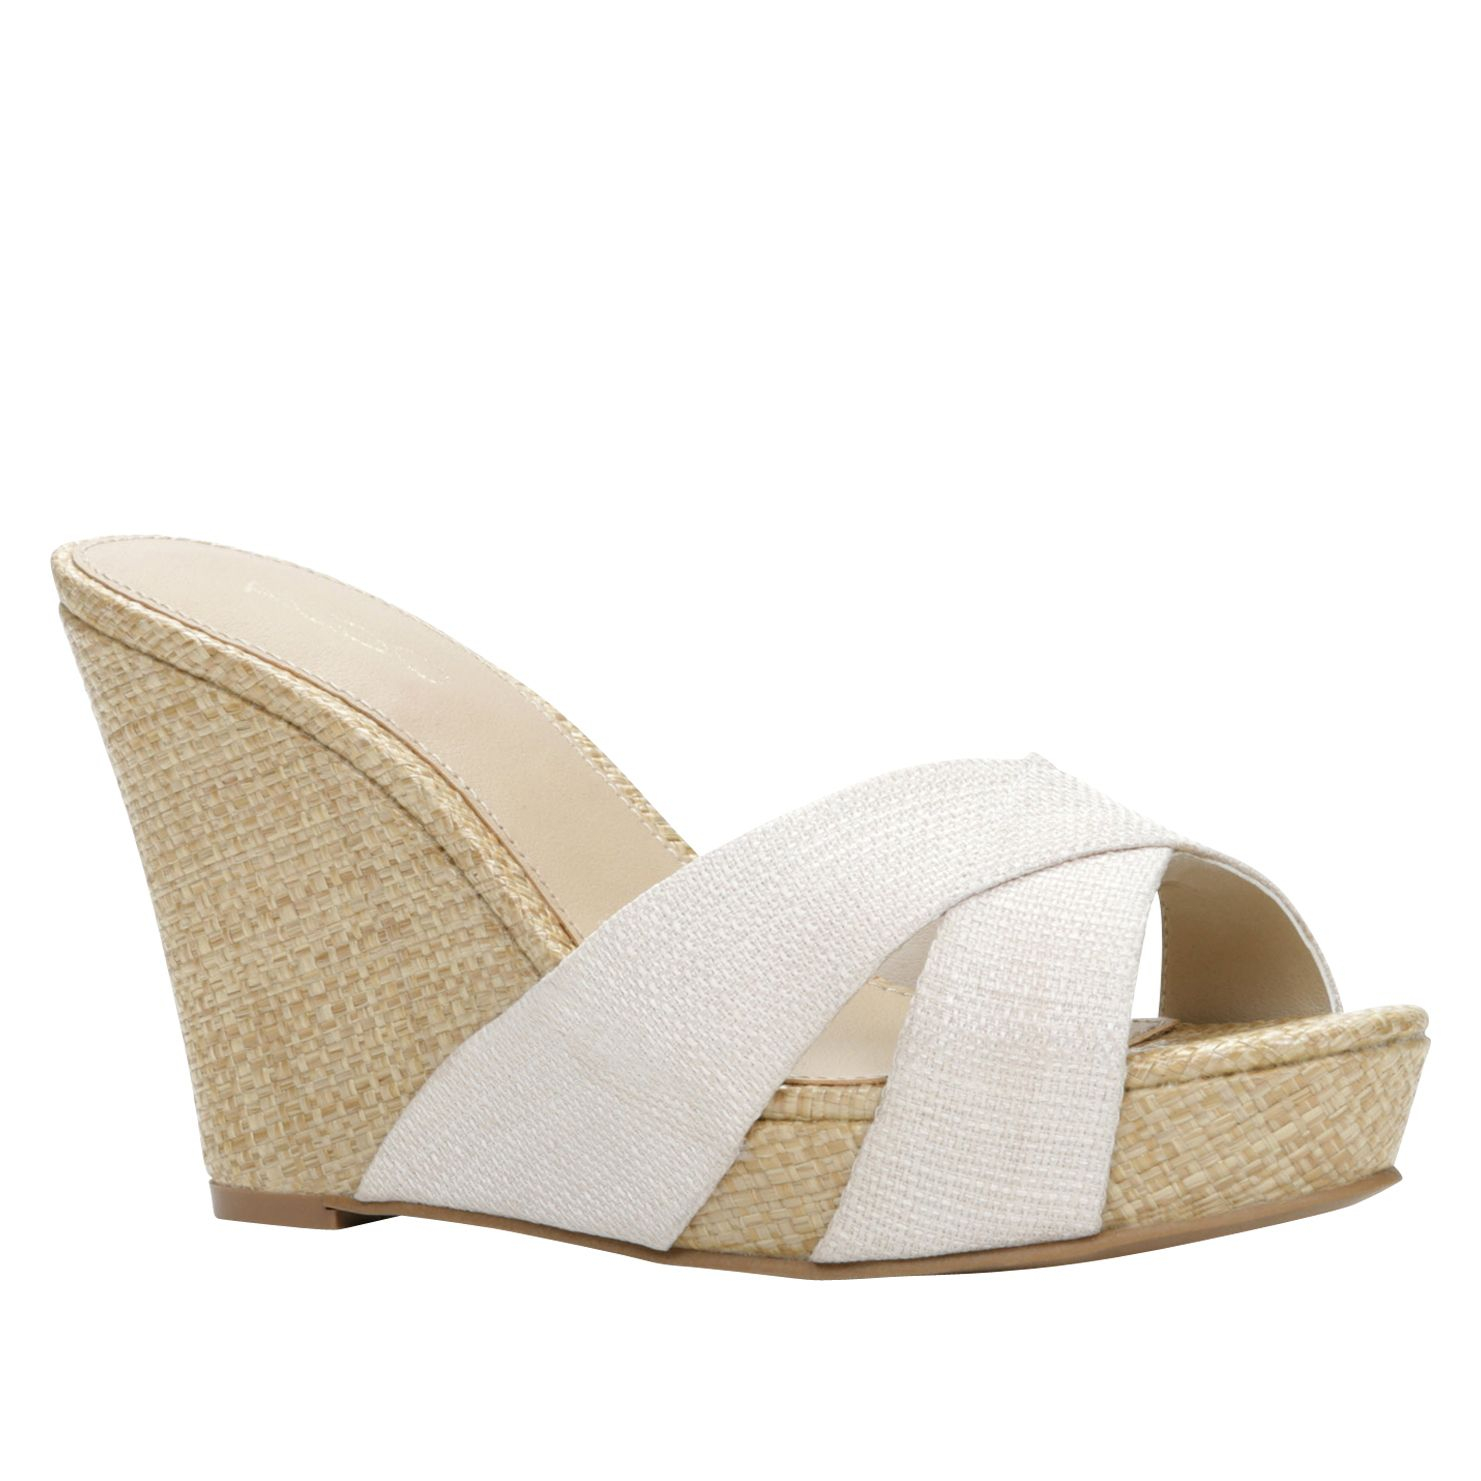 aldo santeramo wedge espadrille sandals in white